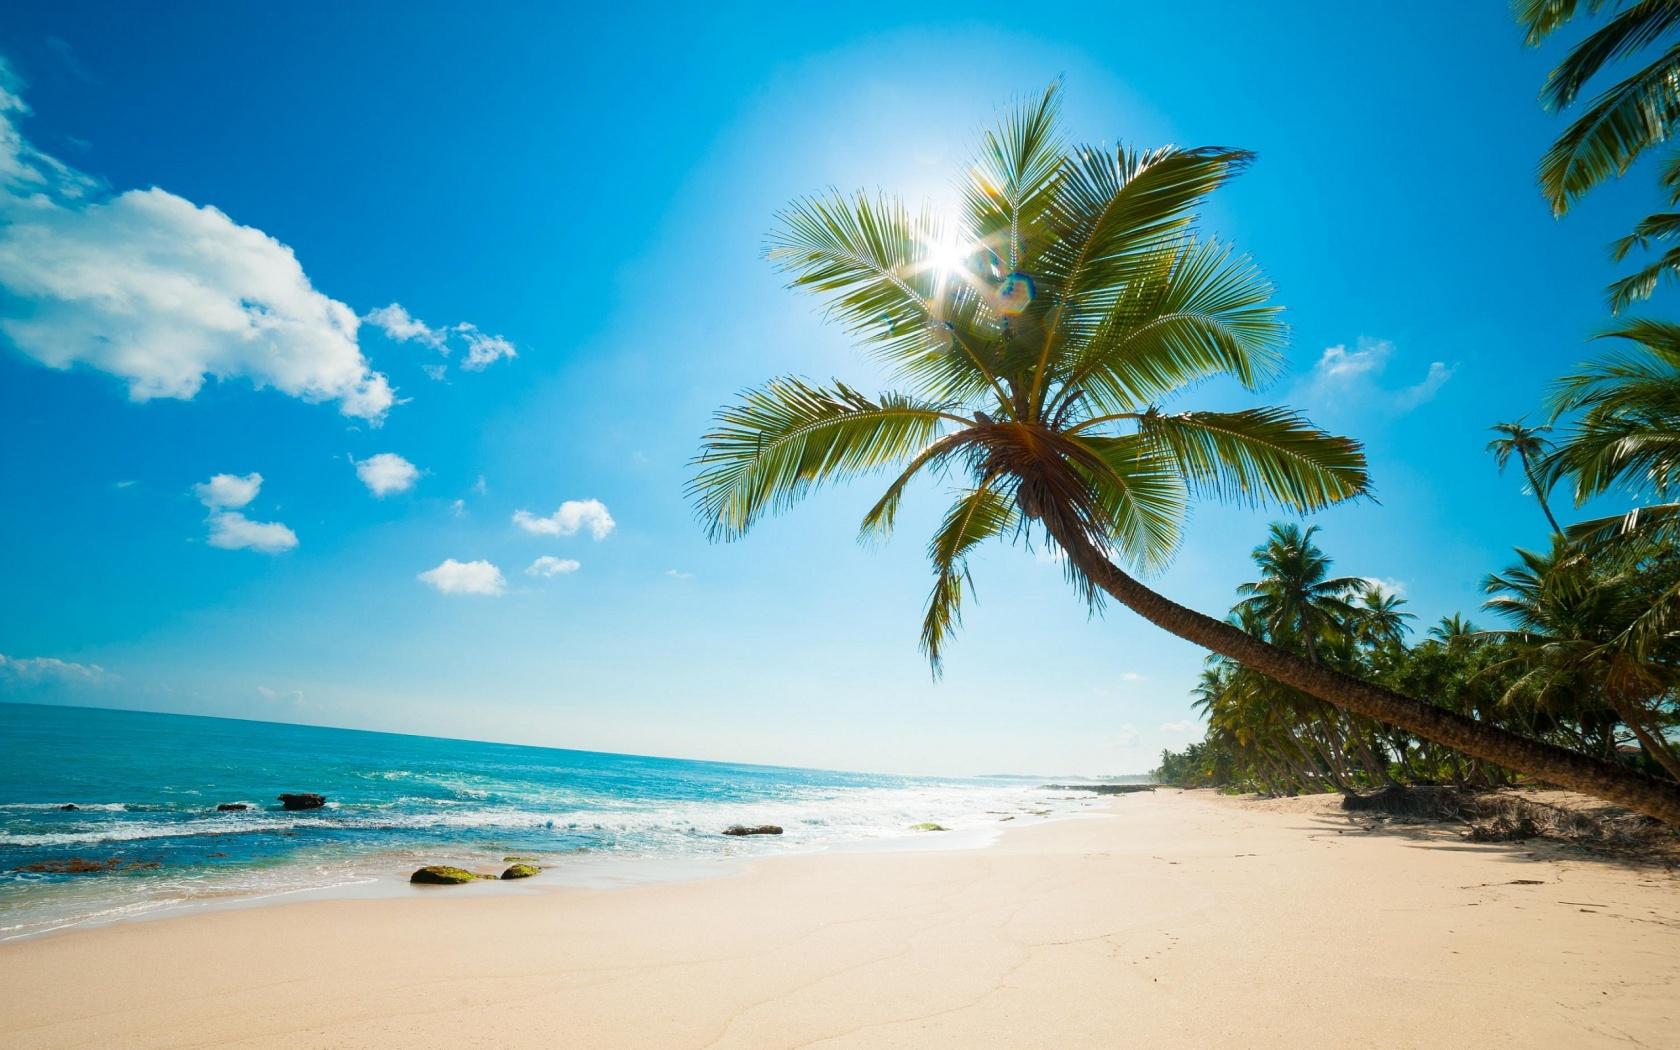 Barbados island travel guide 03